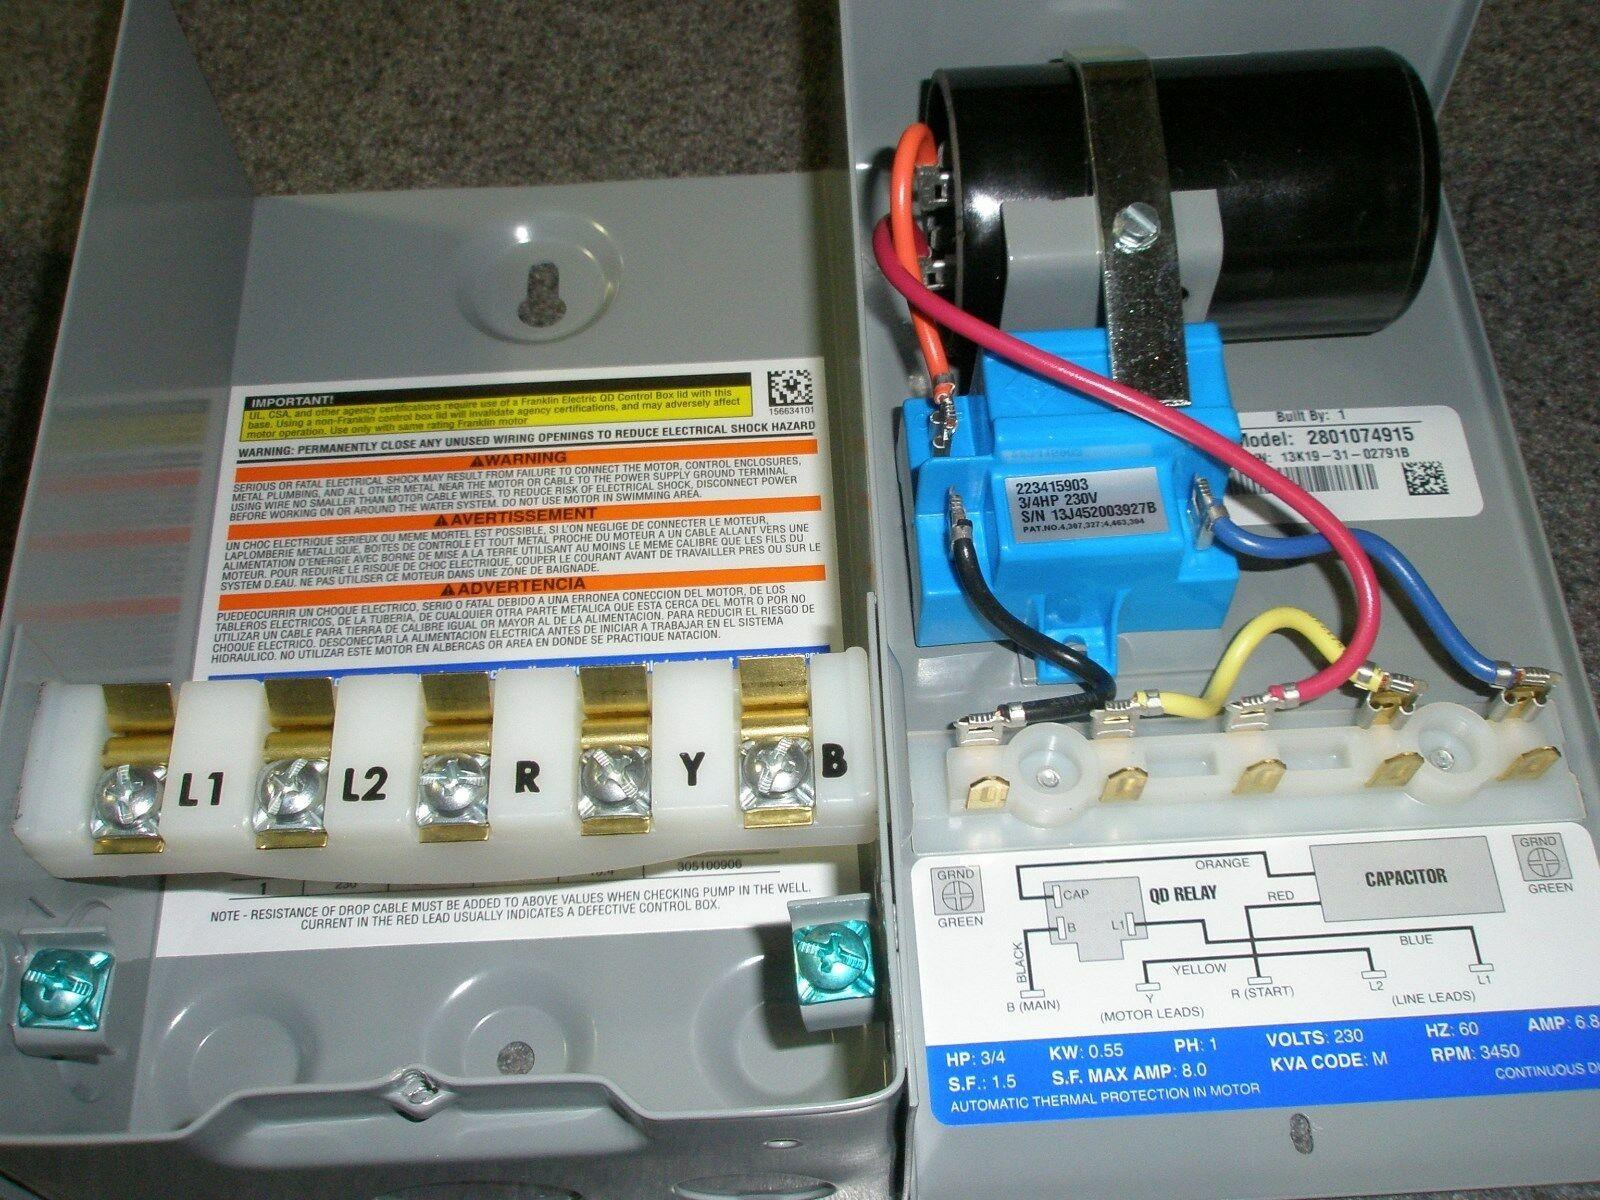 Qd Control Box Wiring 3 4 Hp 230v Franklin Qd Control Box Submersible Water Pump New Of Qd Control Box Wiring